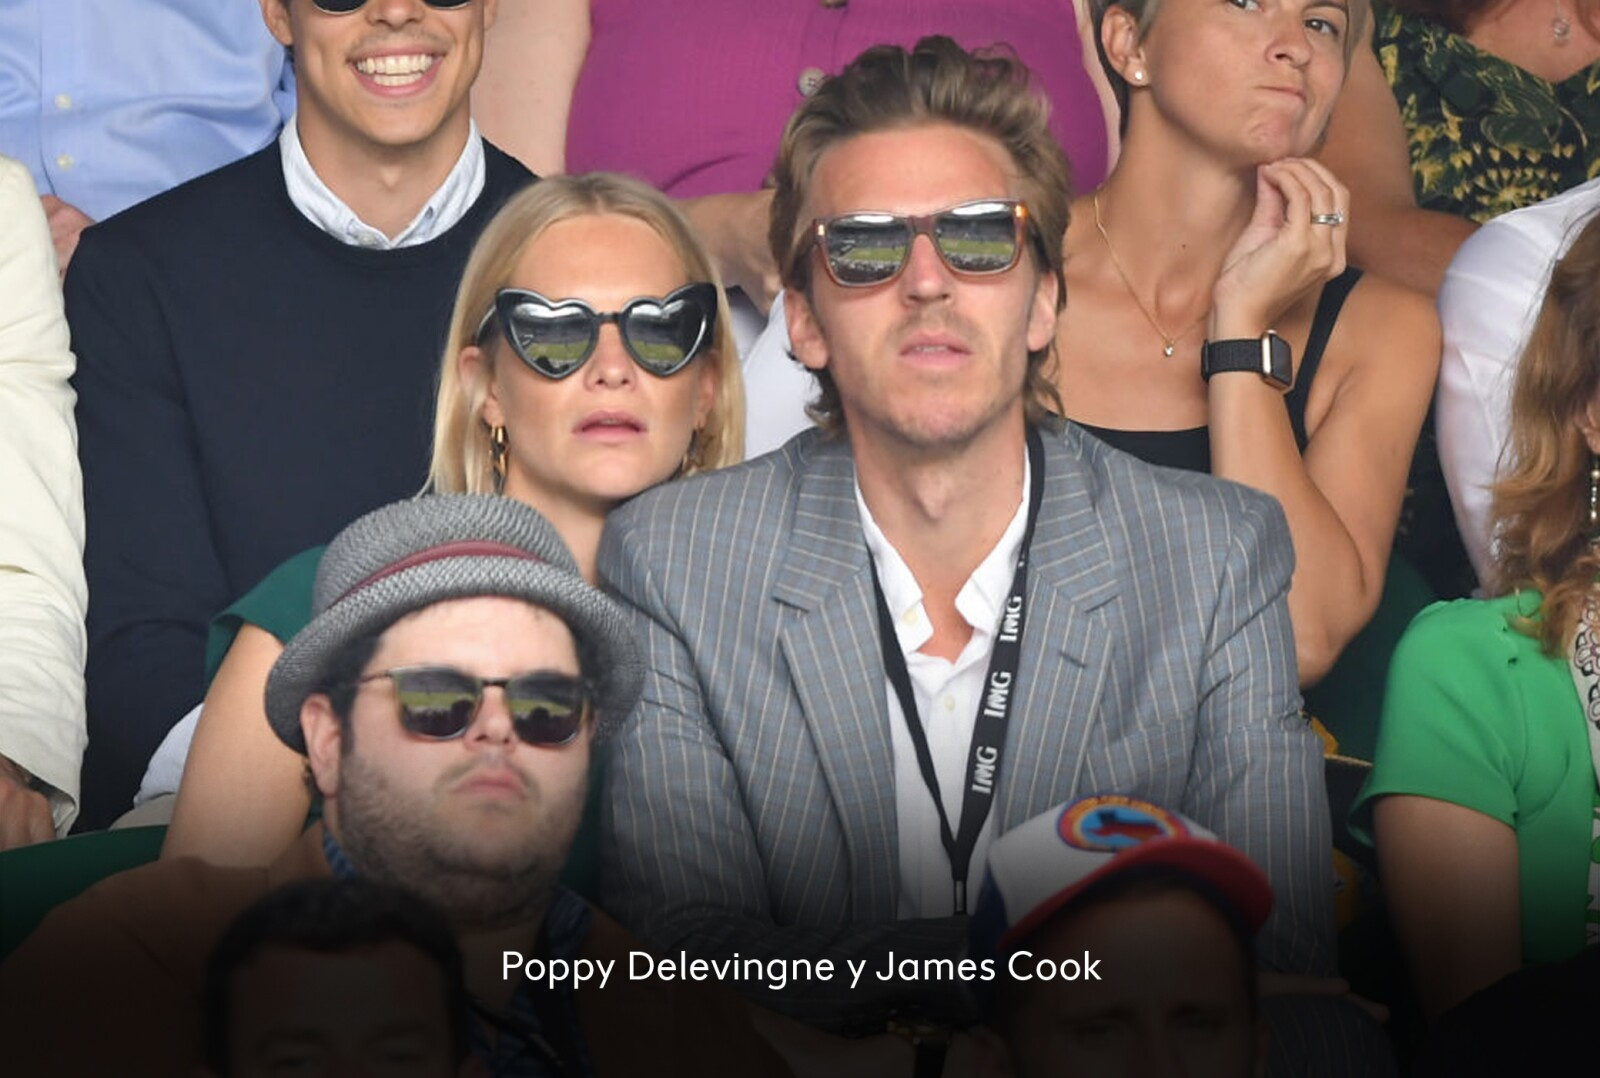 Poppy Delevingne y James Cook